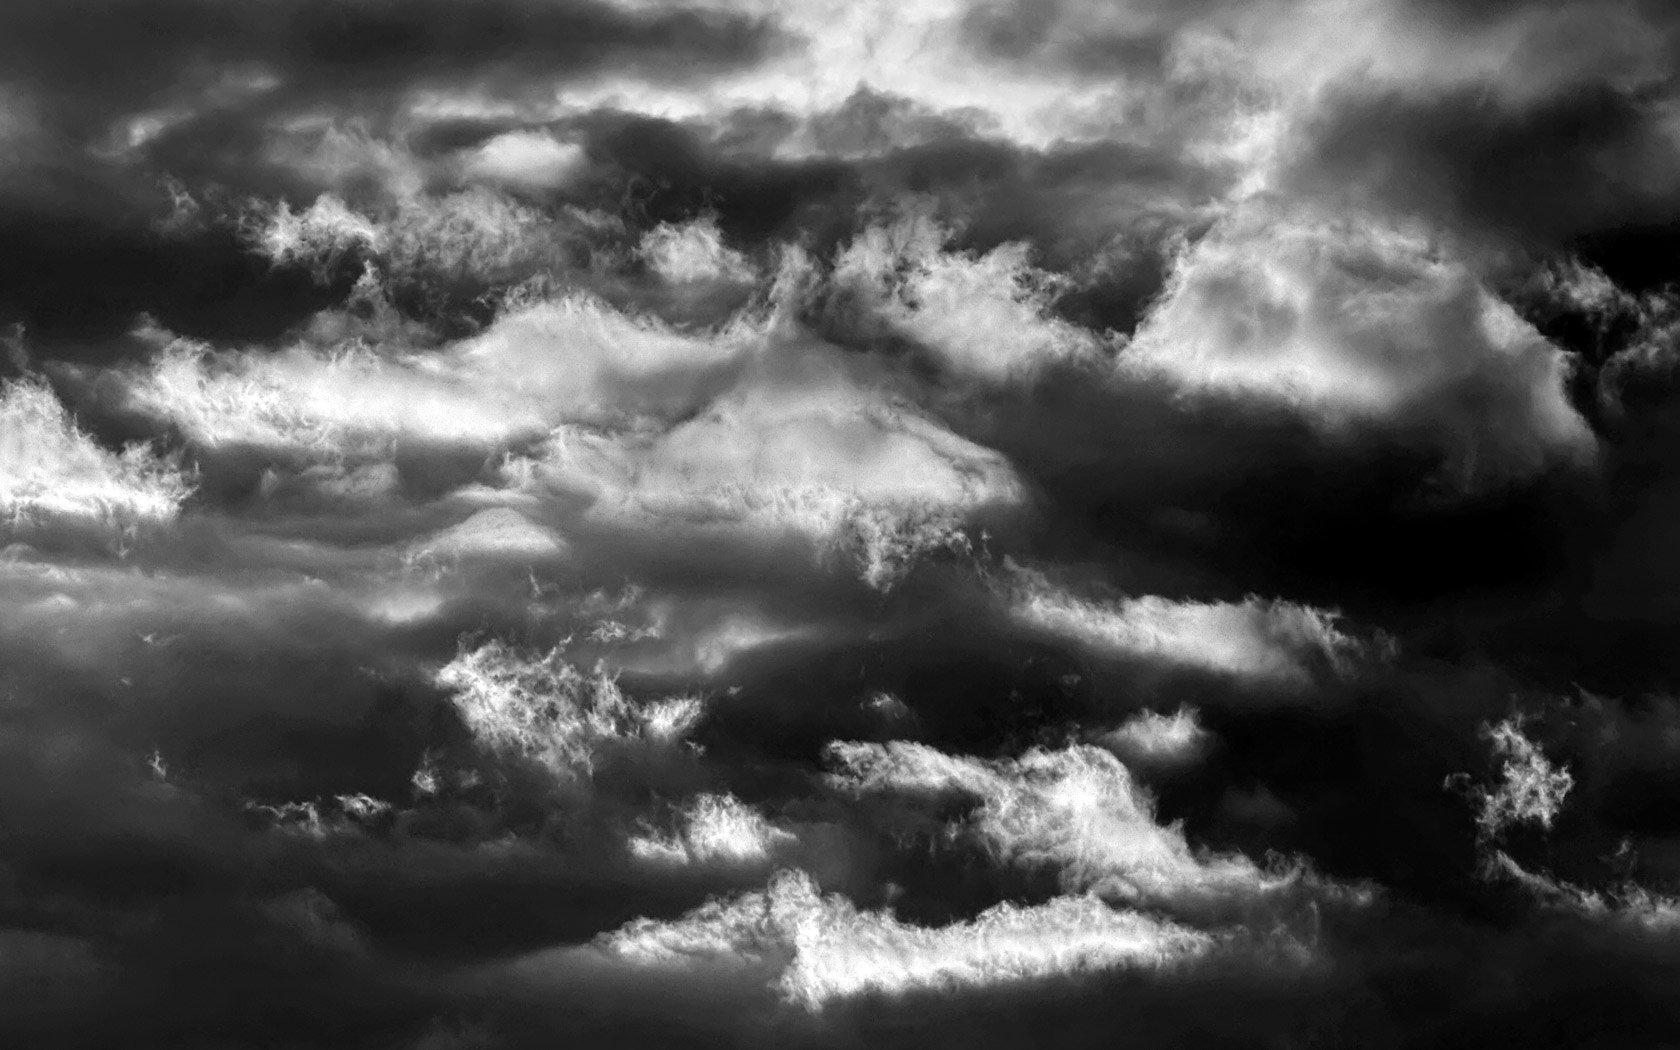 Storm Clouds Wallpapers: Storm Cloud Desktop Wallpaper